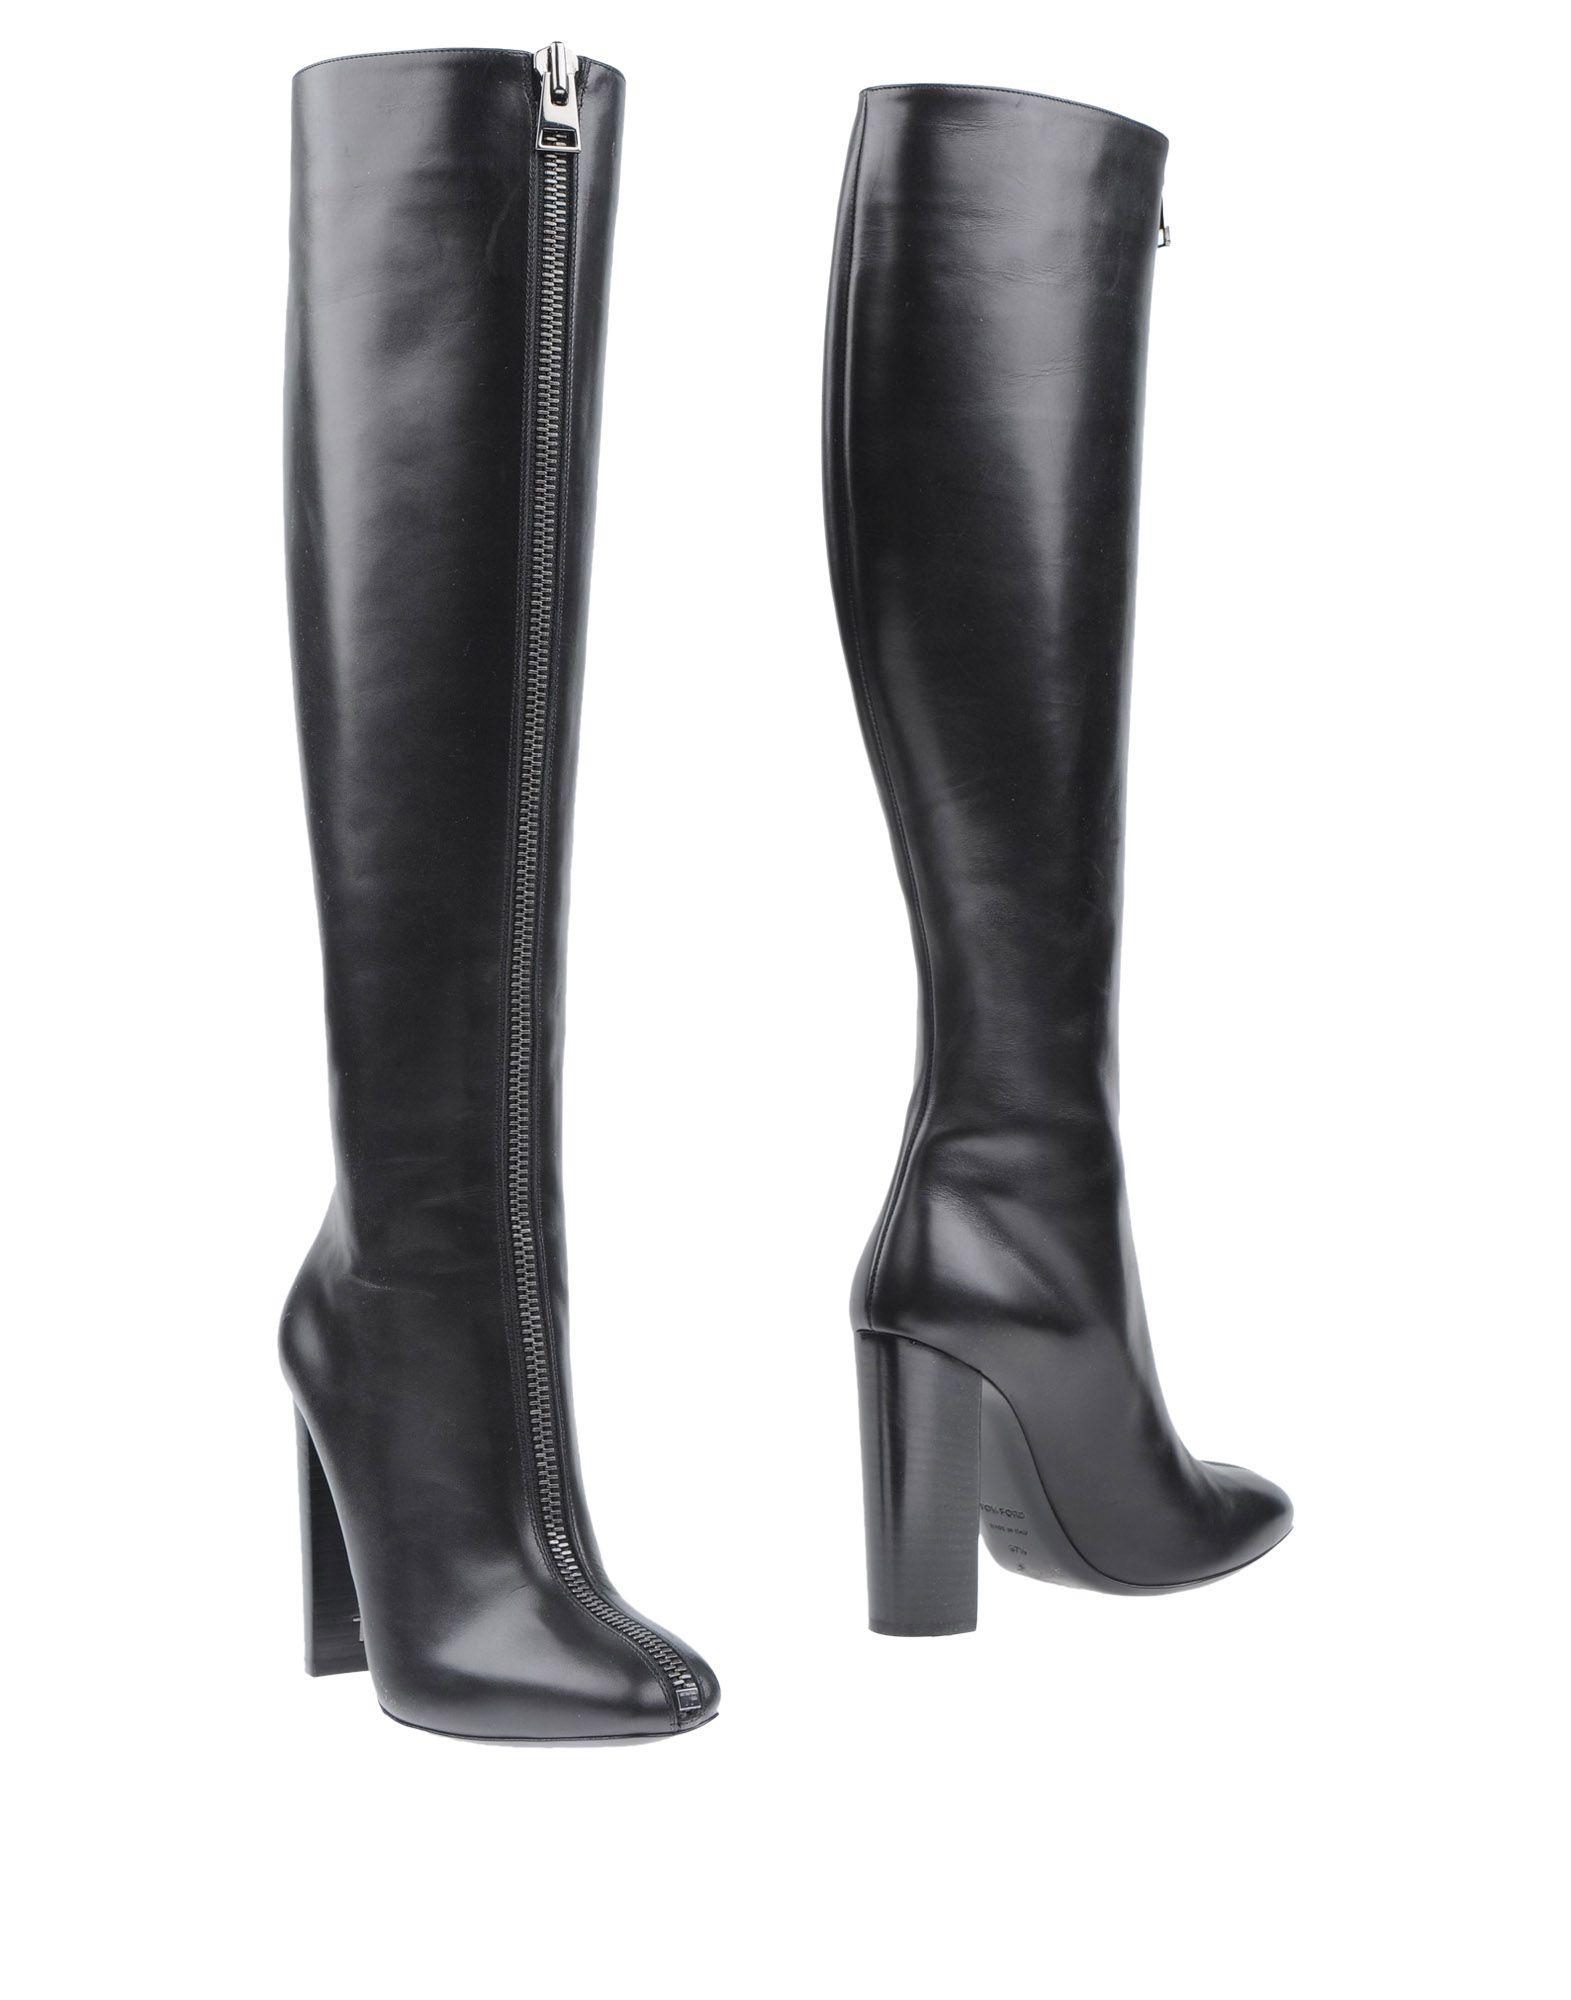 Tom Ford Stiefel Damen  Schuhe 11319252TAGünstige gut aussehende Schuhe  7f3e63